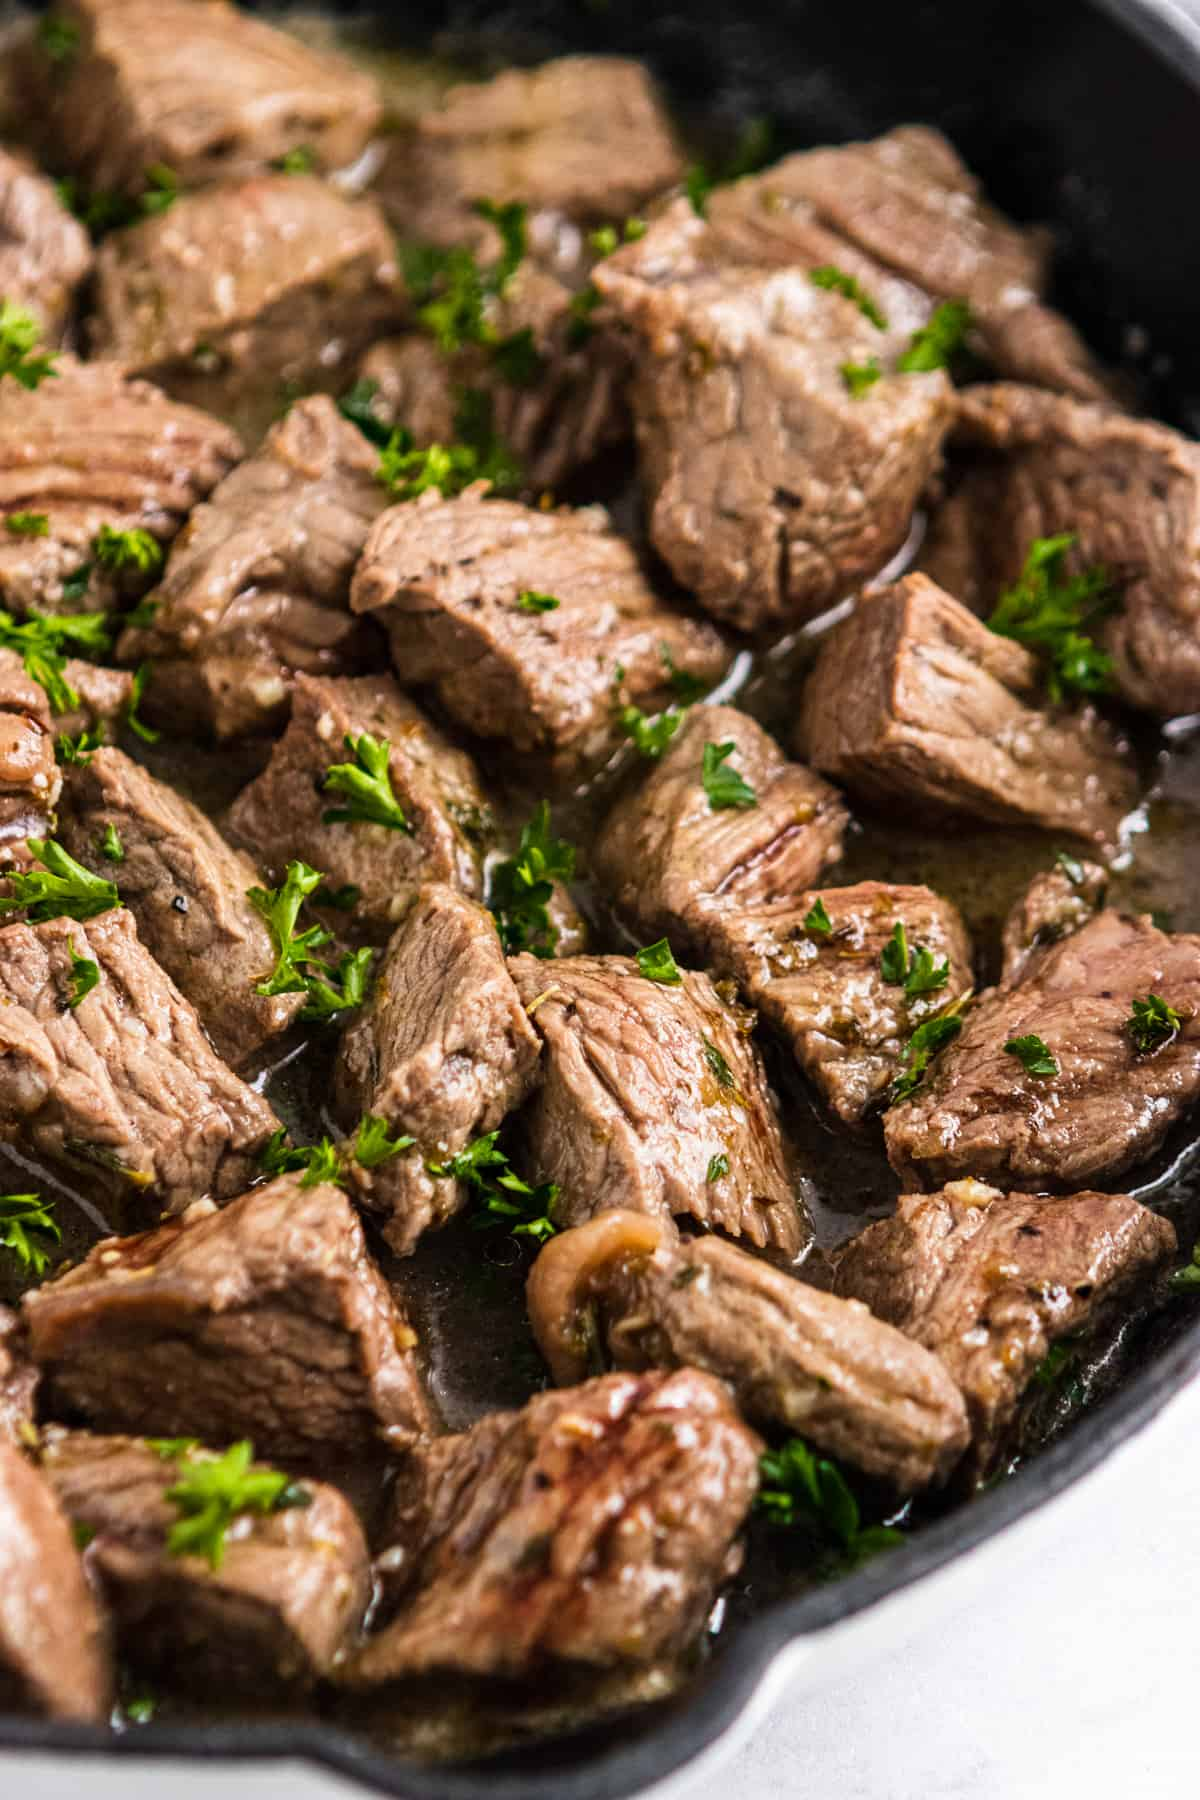 Close up of steak bites recipe.